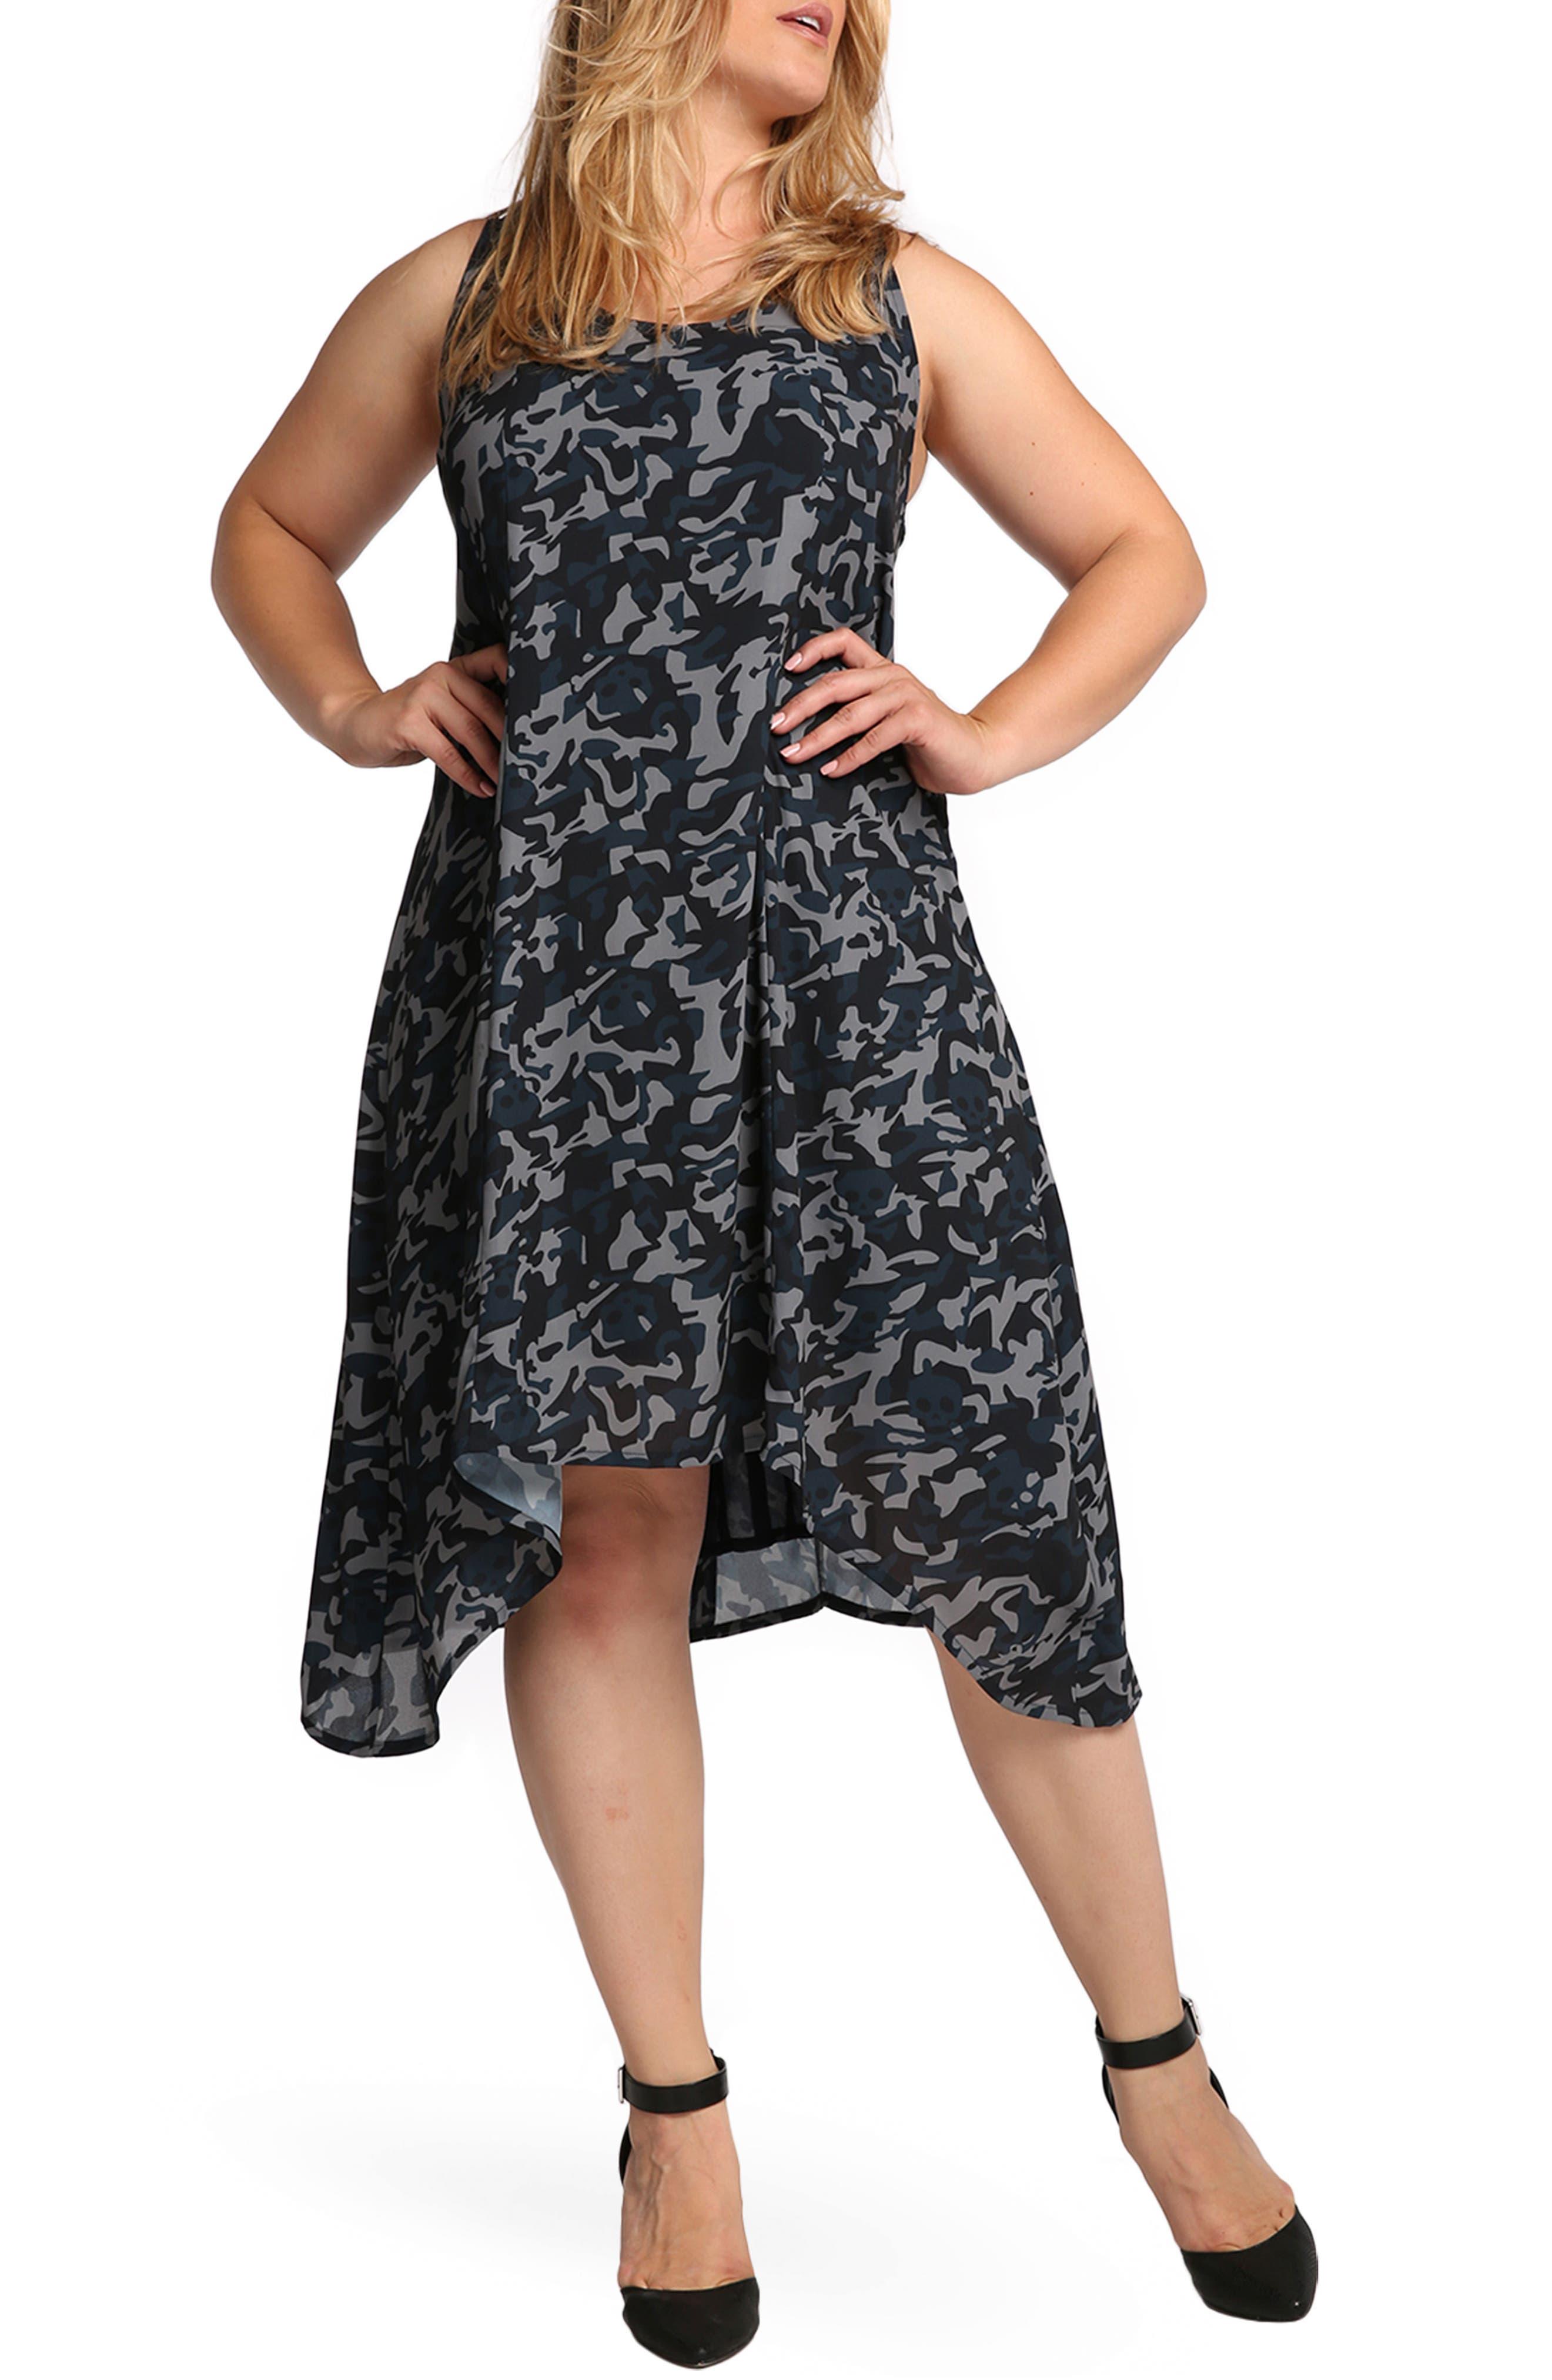 Ace Camo Print Tank Dress,                         Main,                         color,